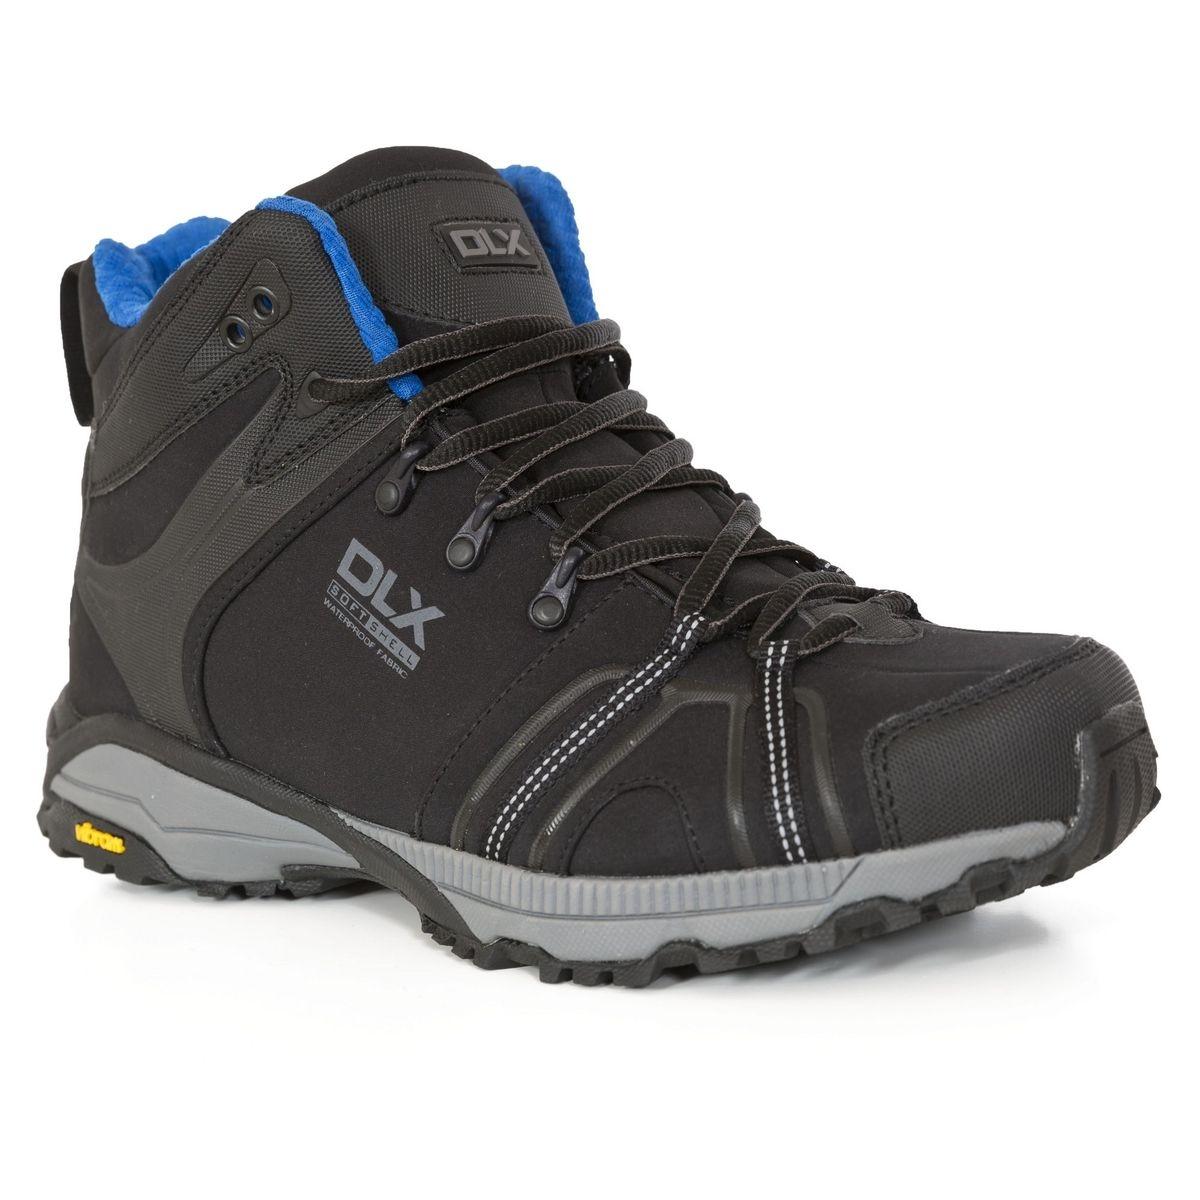 Chaussures de randonnée Softshell RHYTHMIC